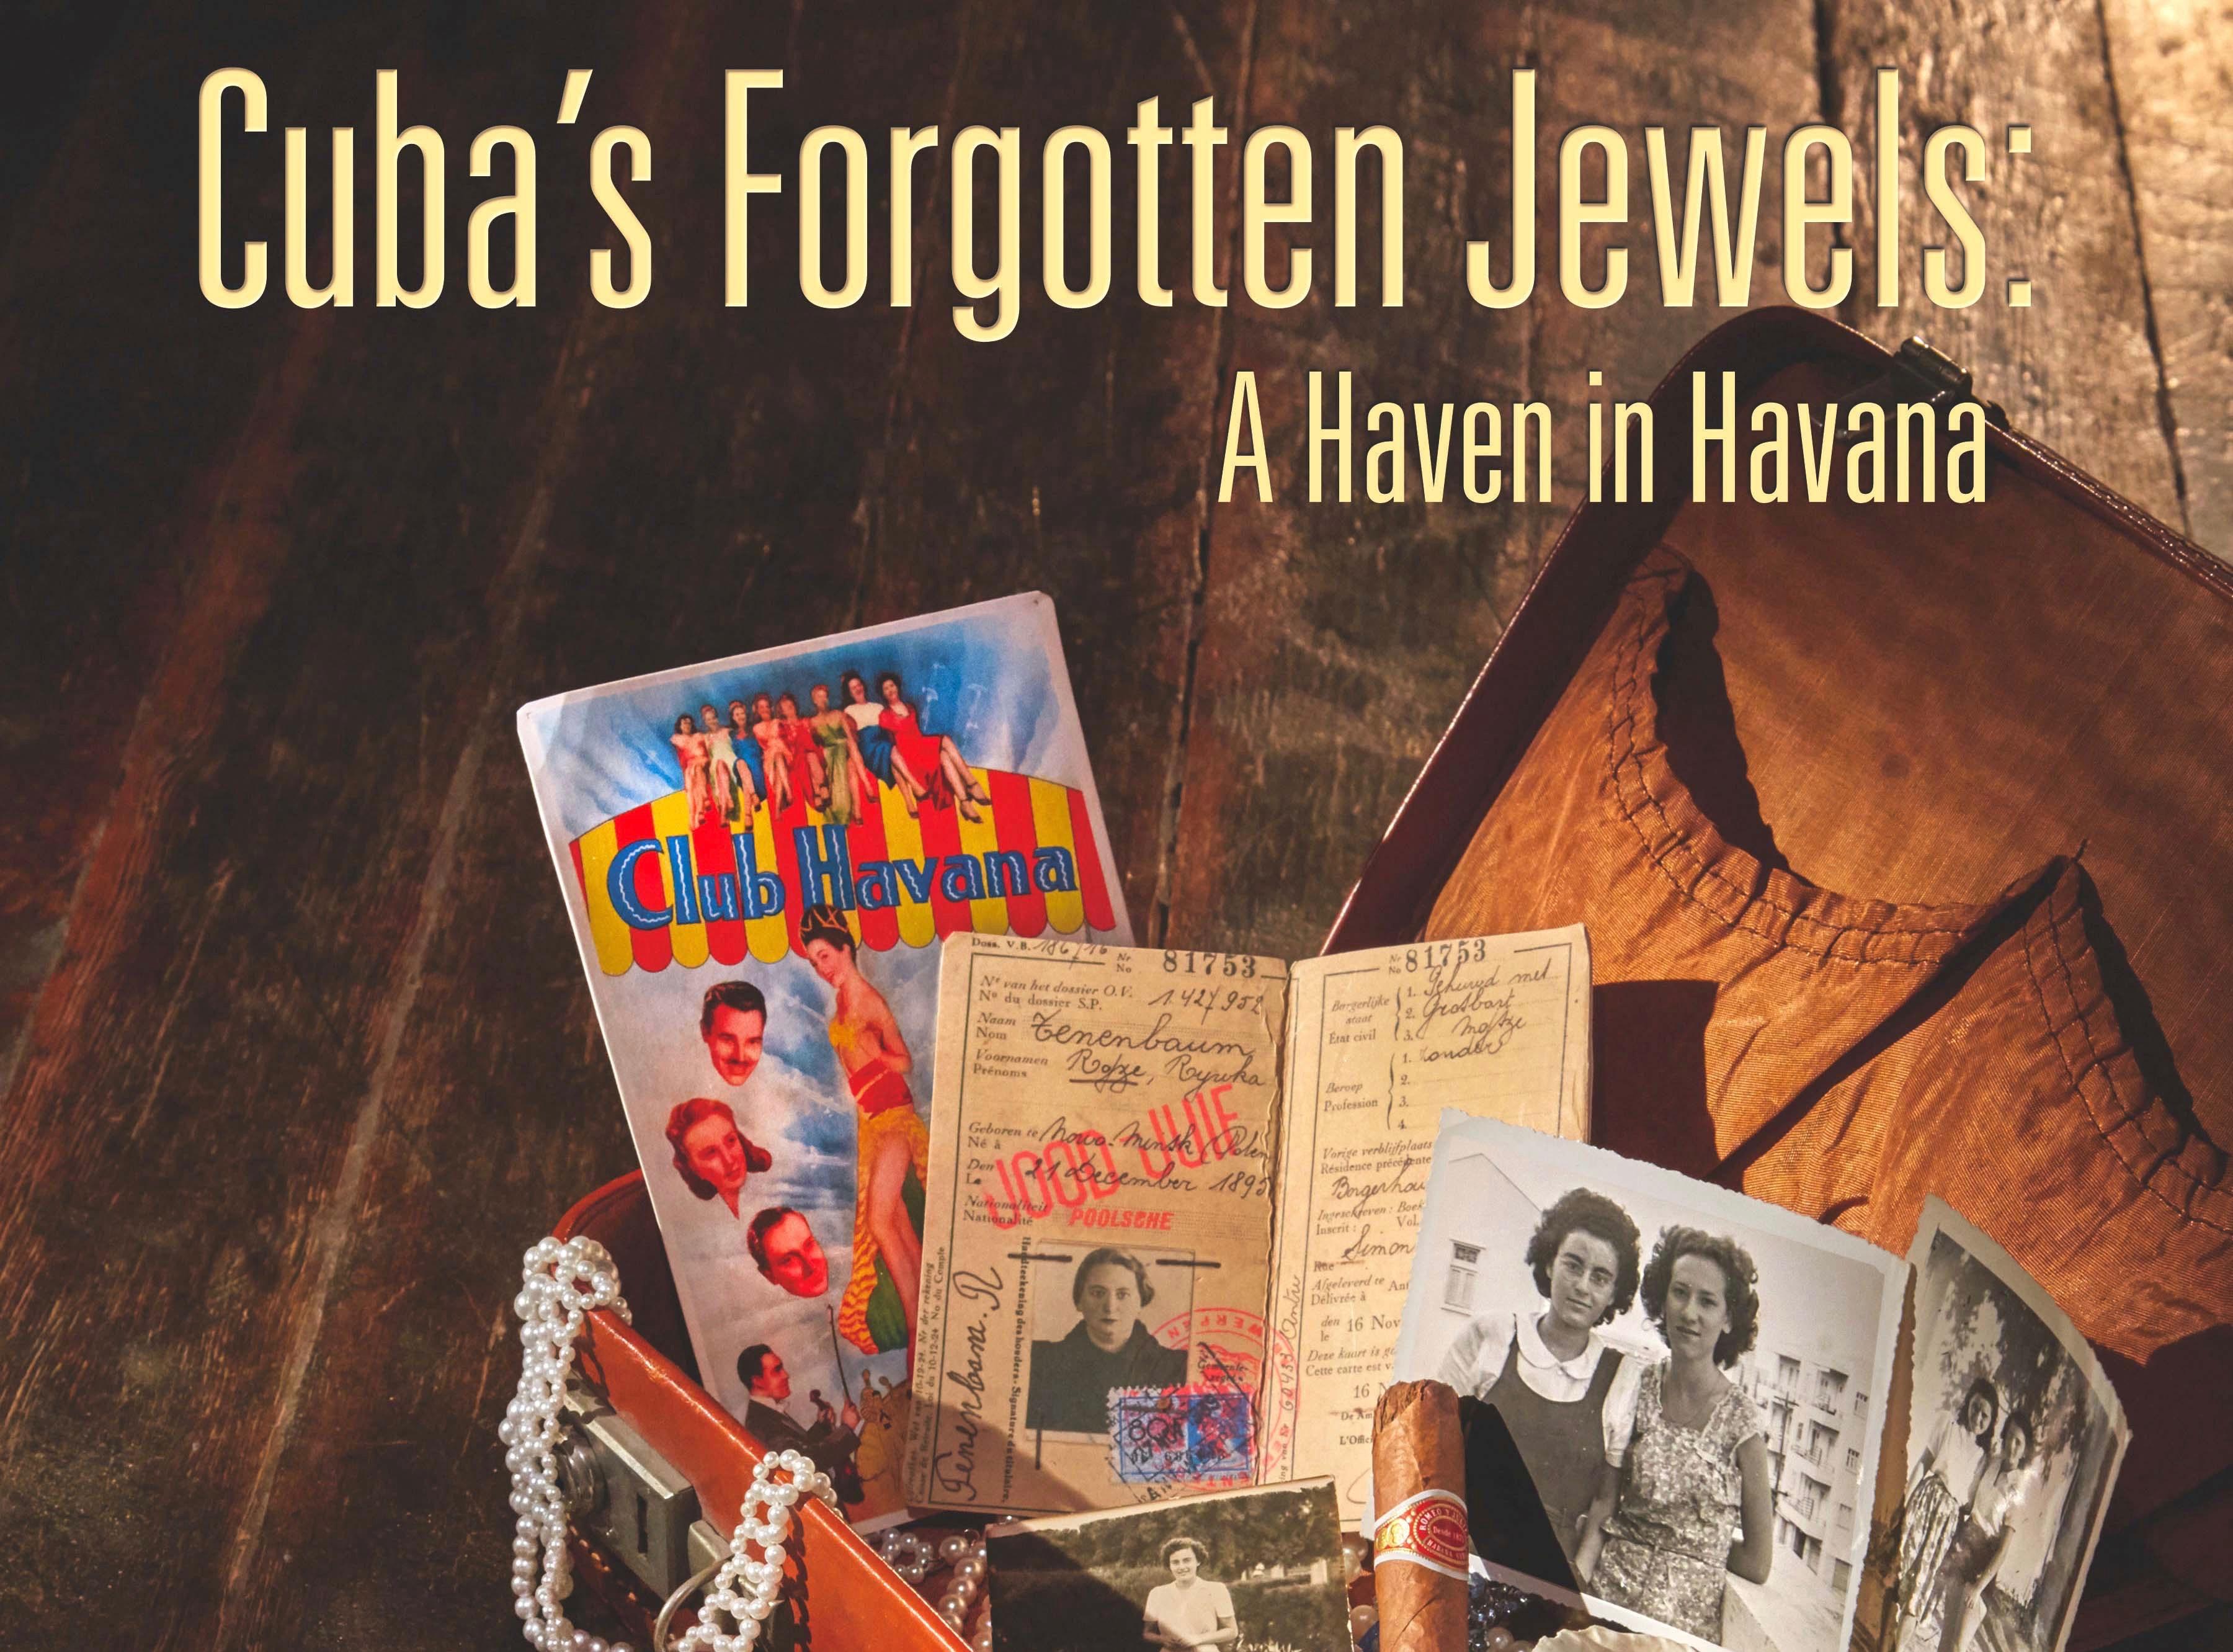 CubasForgottenJewels_Poster_Courtesy_National Center for Jewish Film (1)